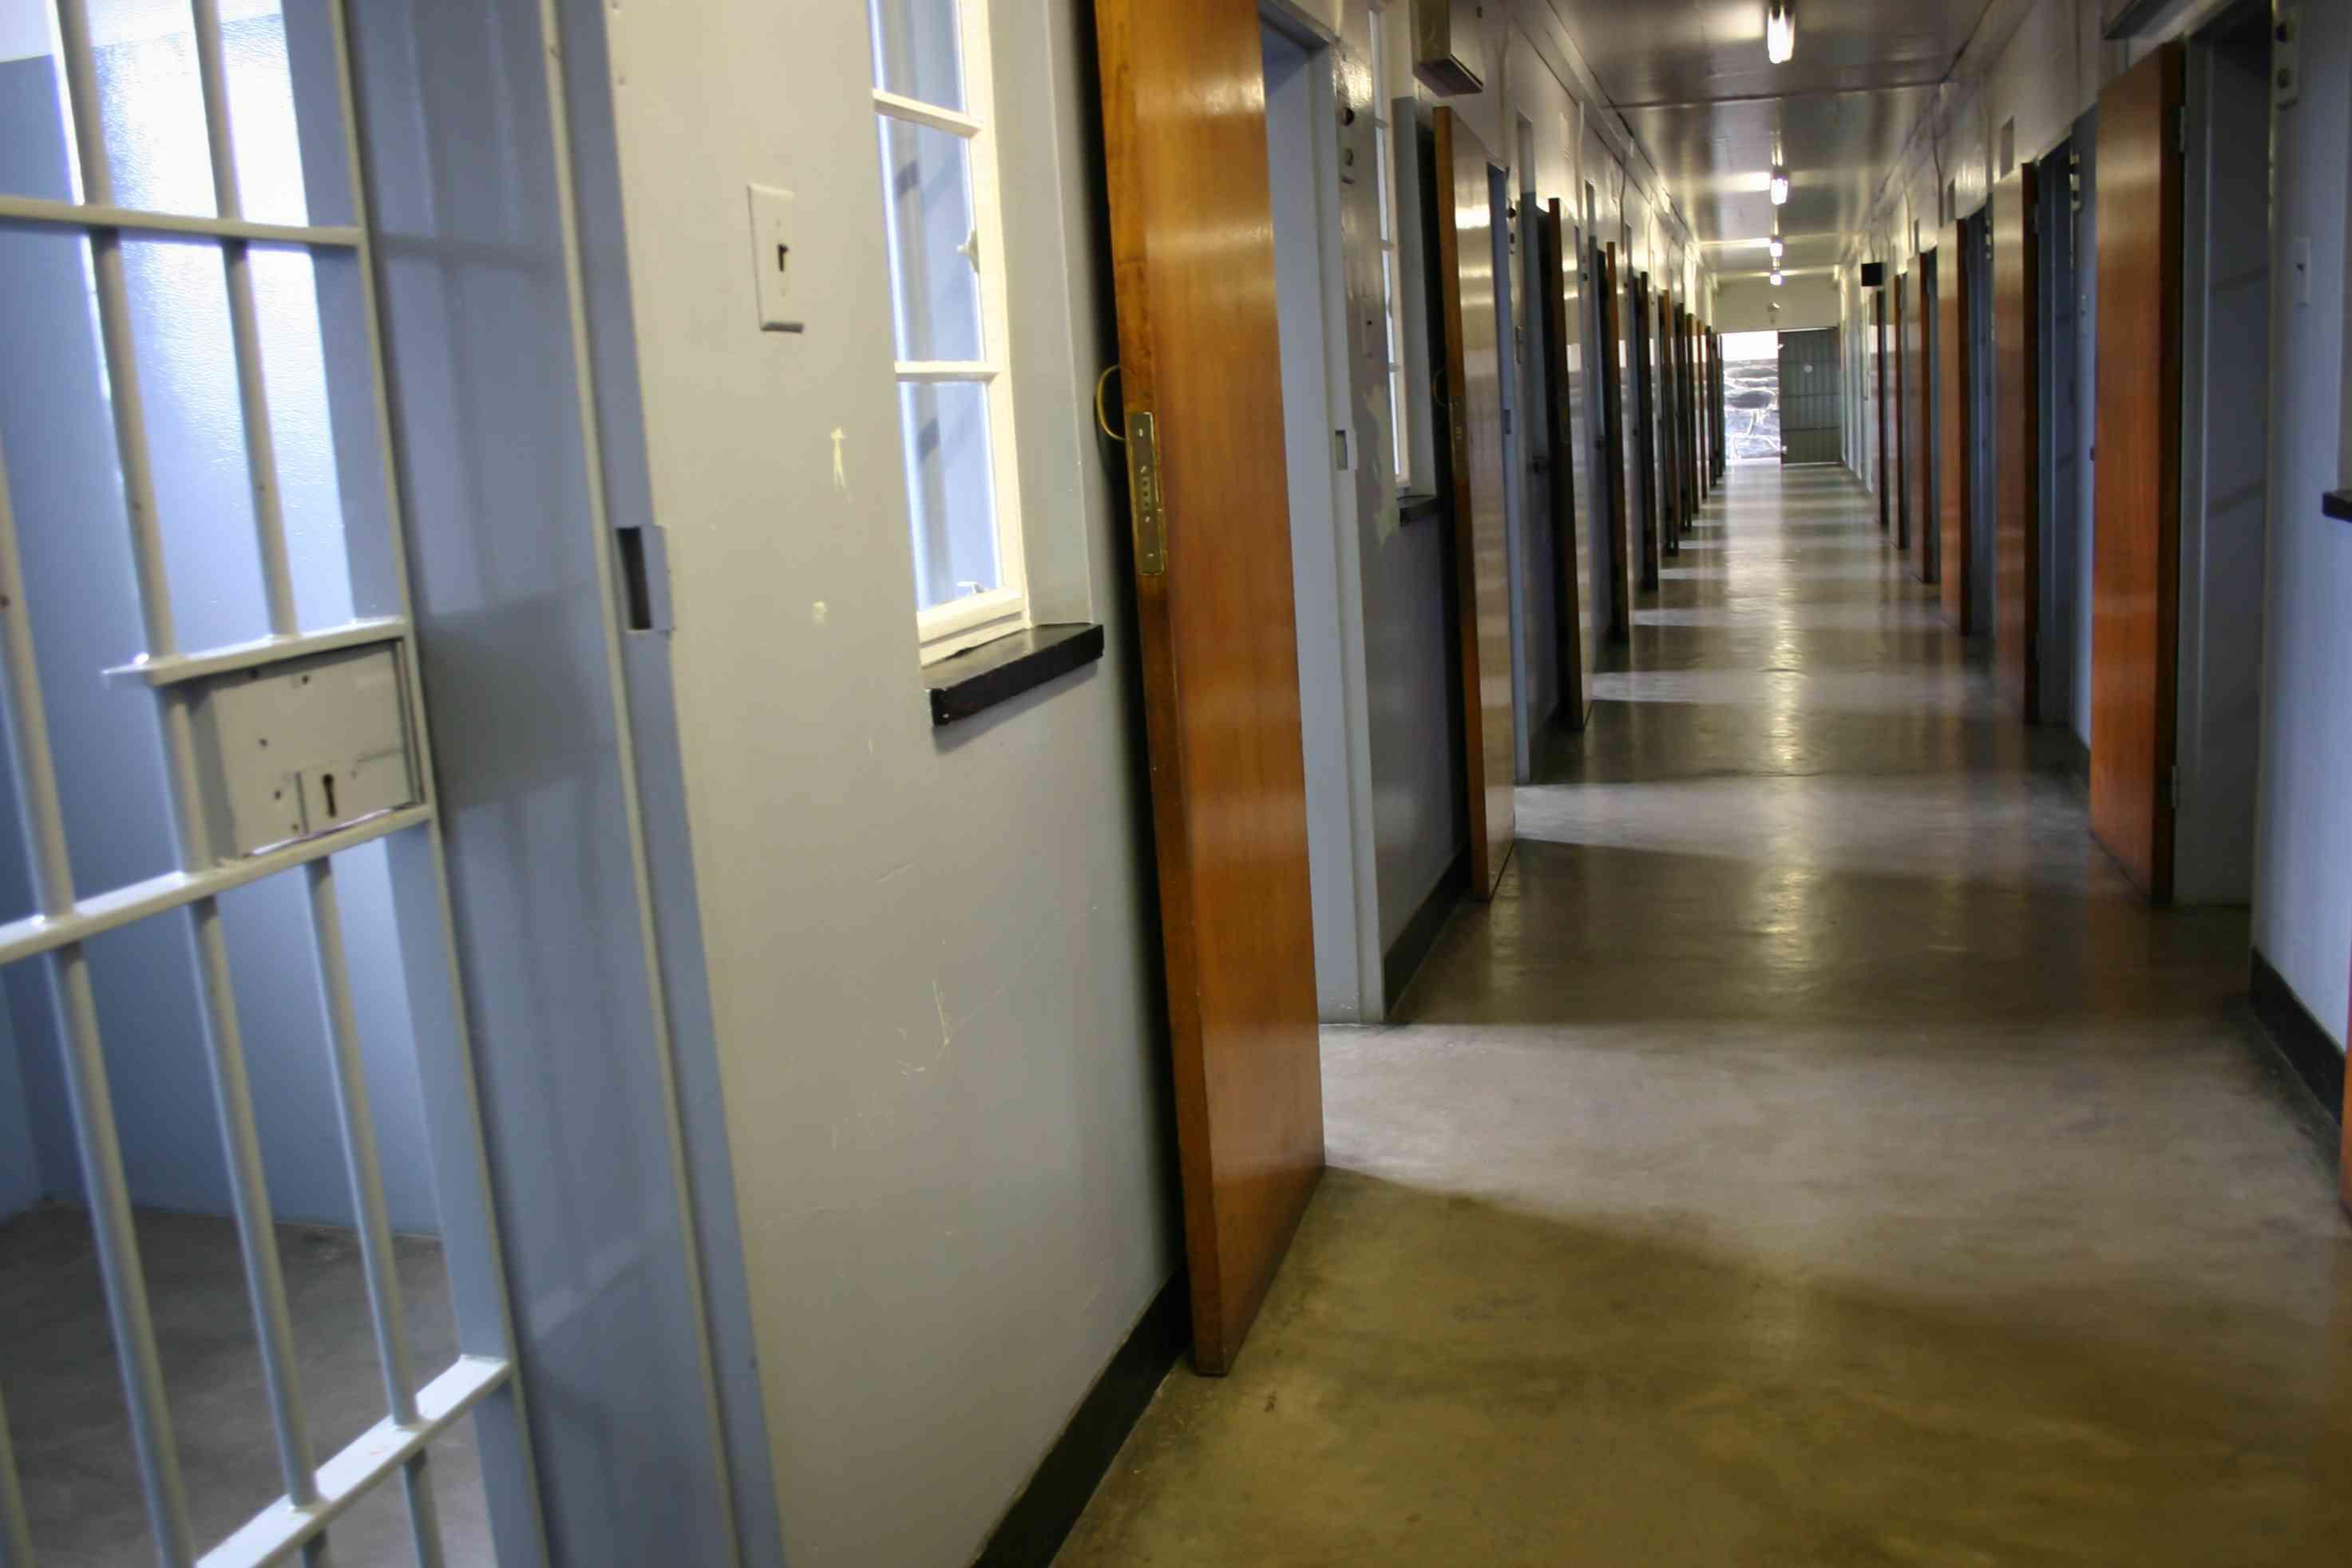 Robben Island Museum, Where Nelson Mandela was Imprisoned